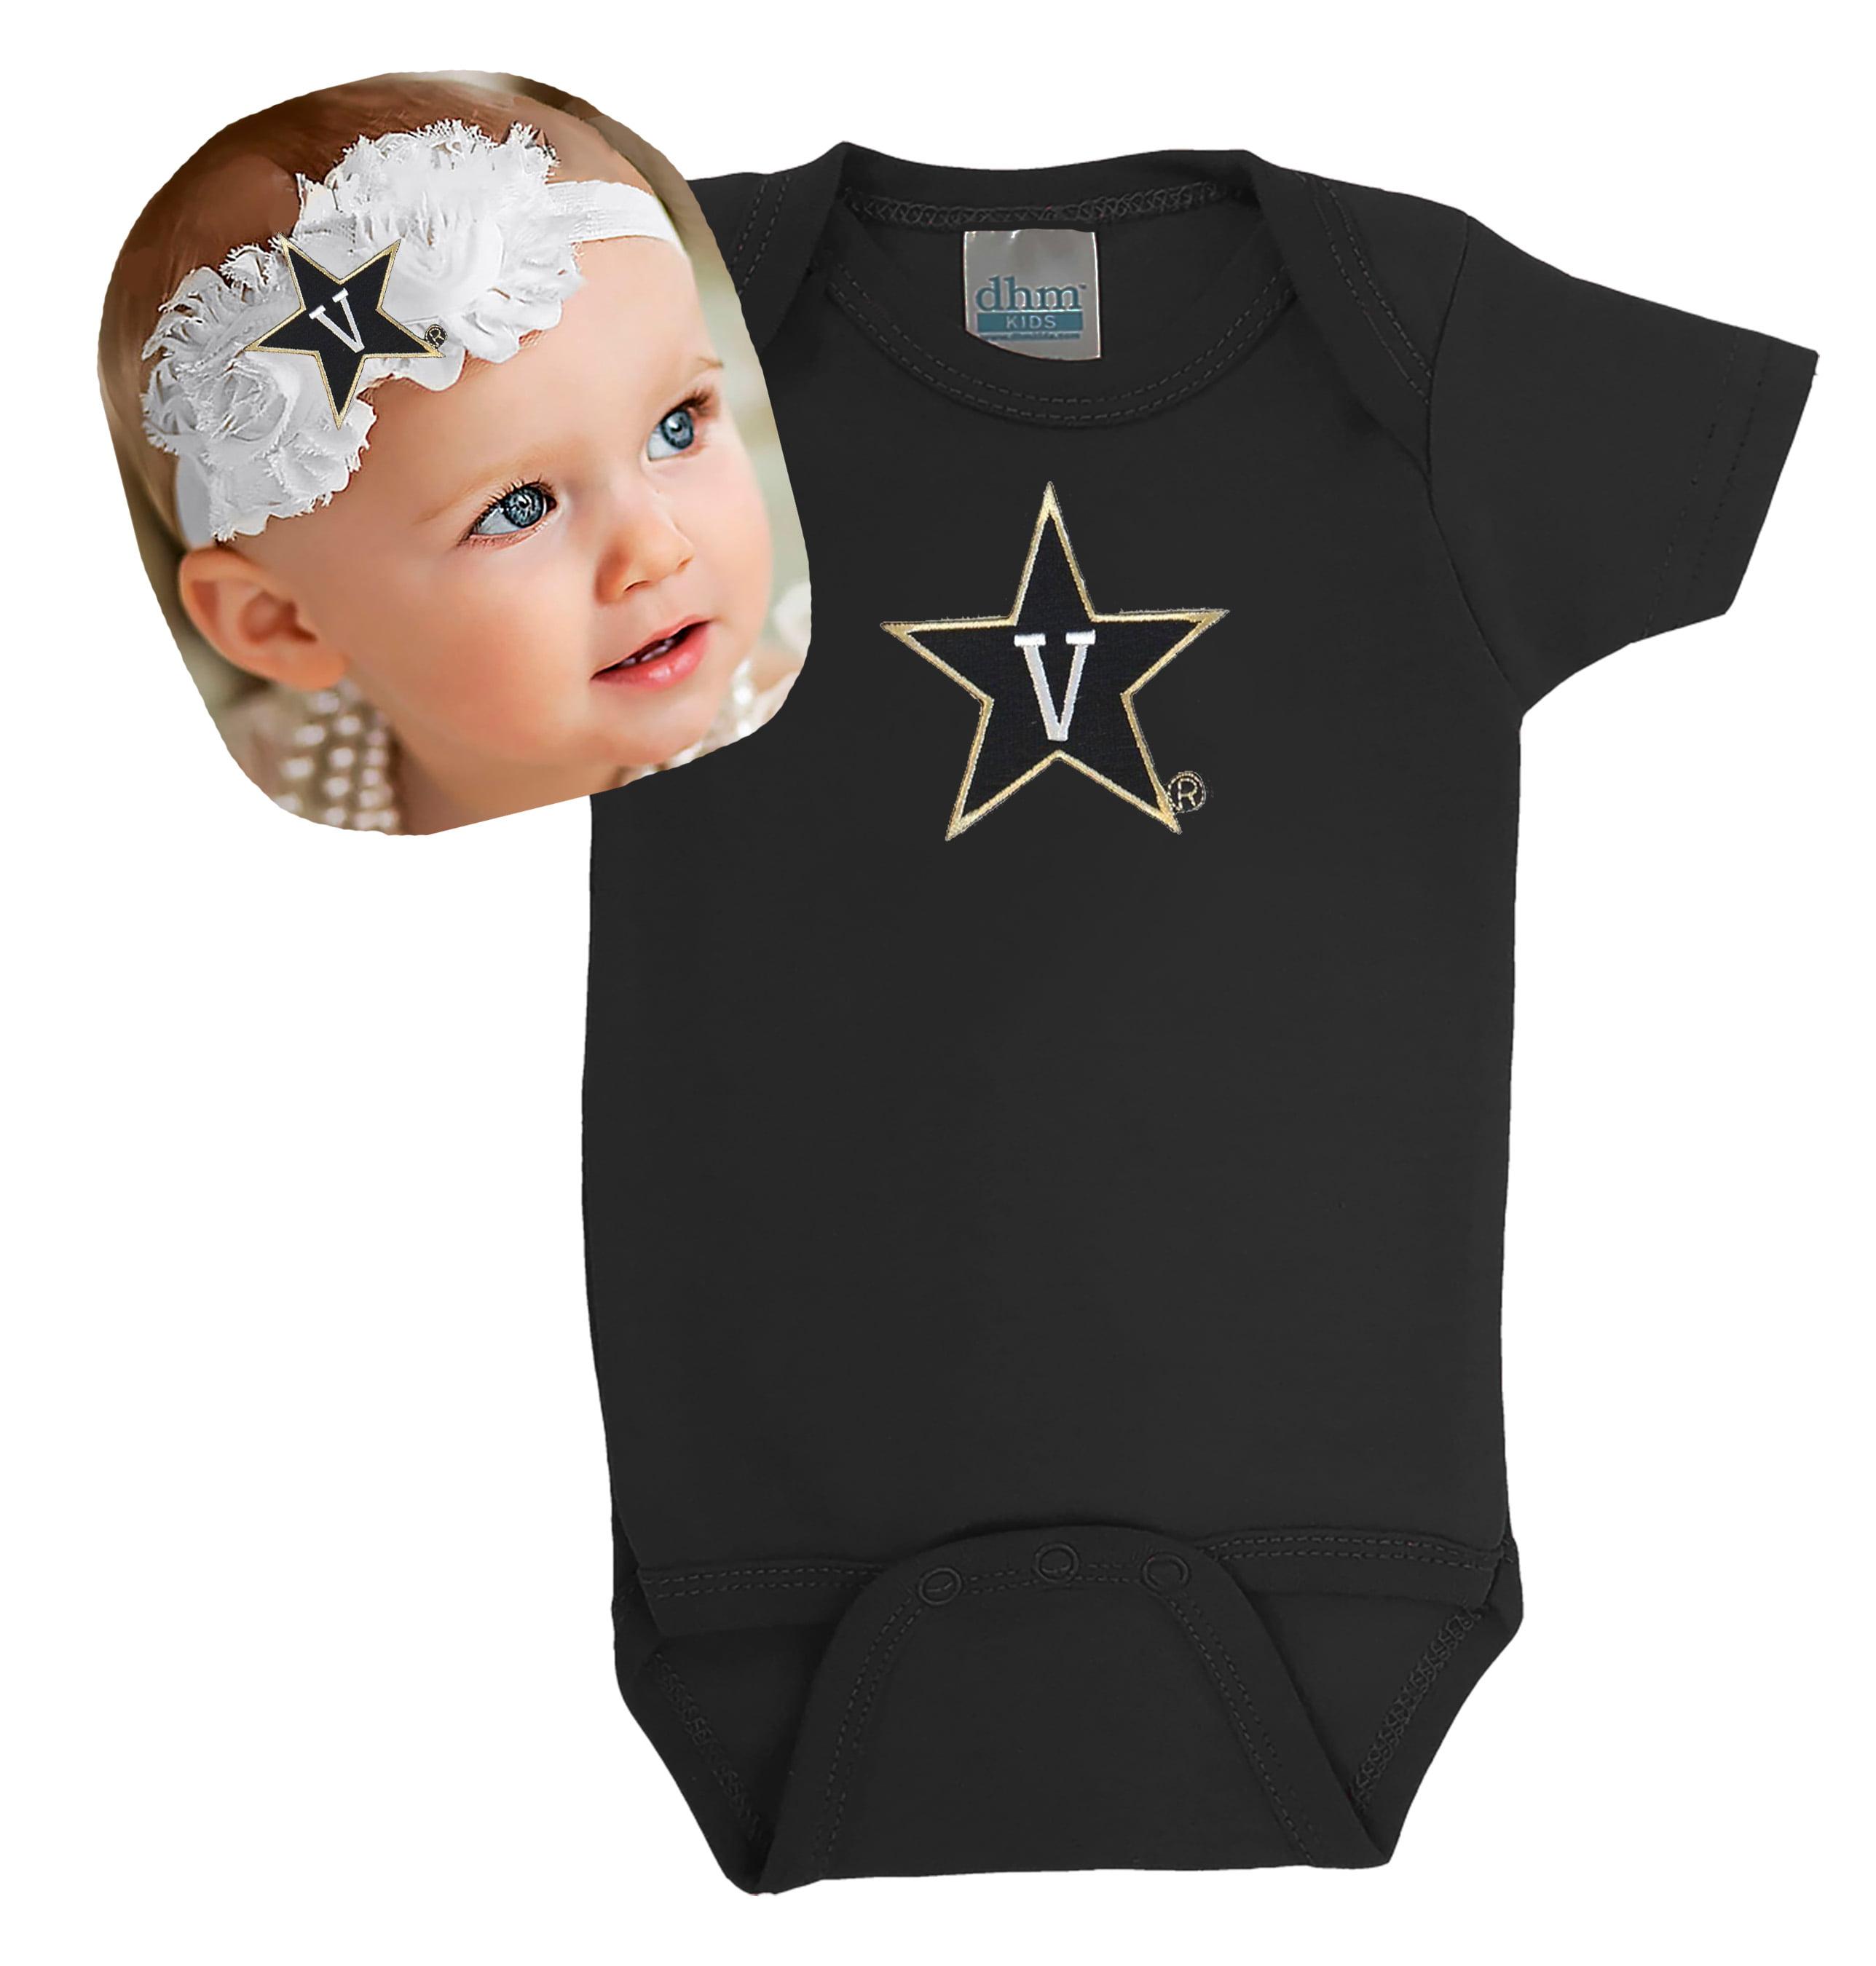 Vanderbilt Commodores Baby Bodysuit and Shabby Flower Headband Set